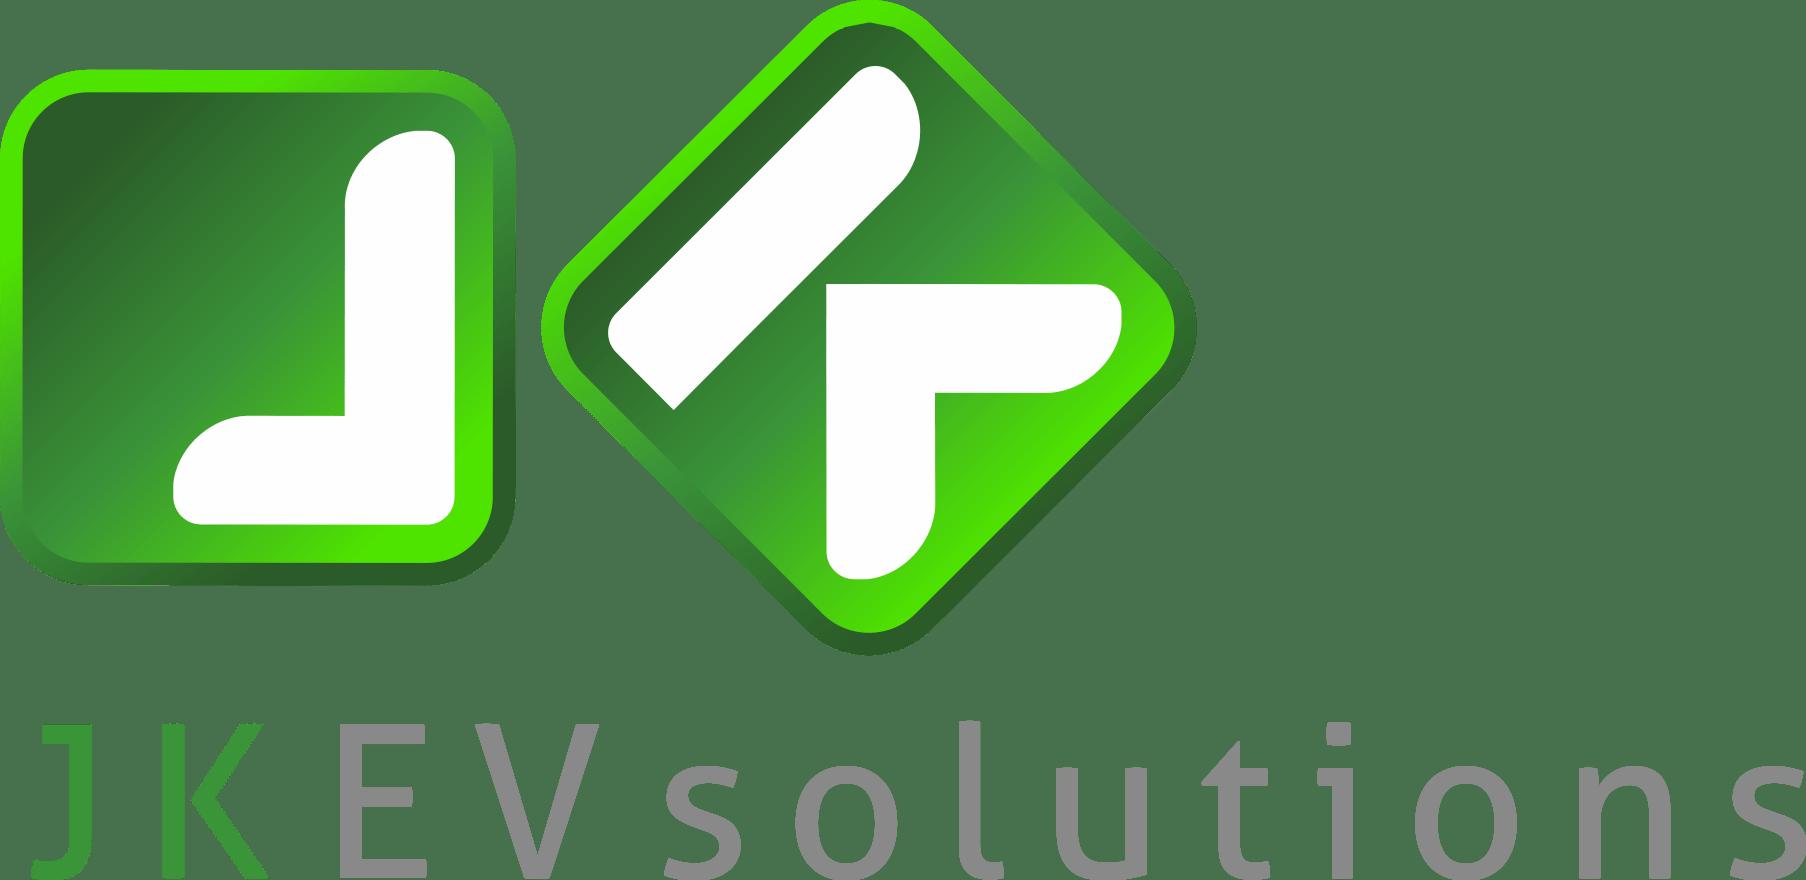 JK EV solutions, uw EV oplaad kennis!